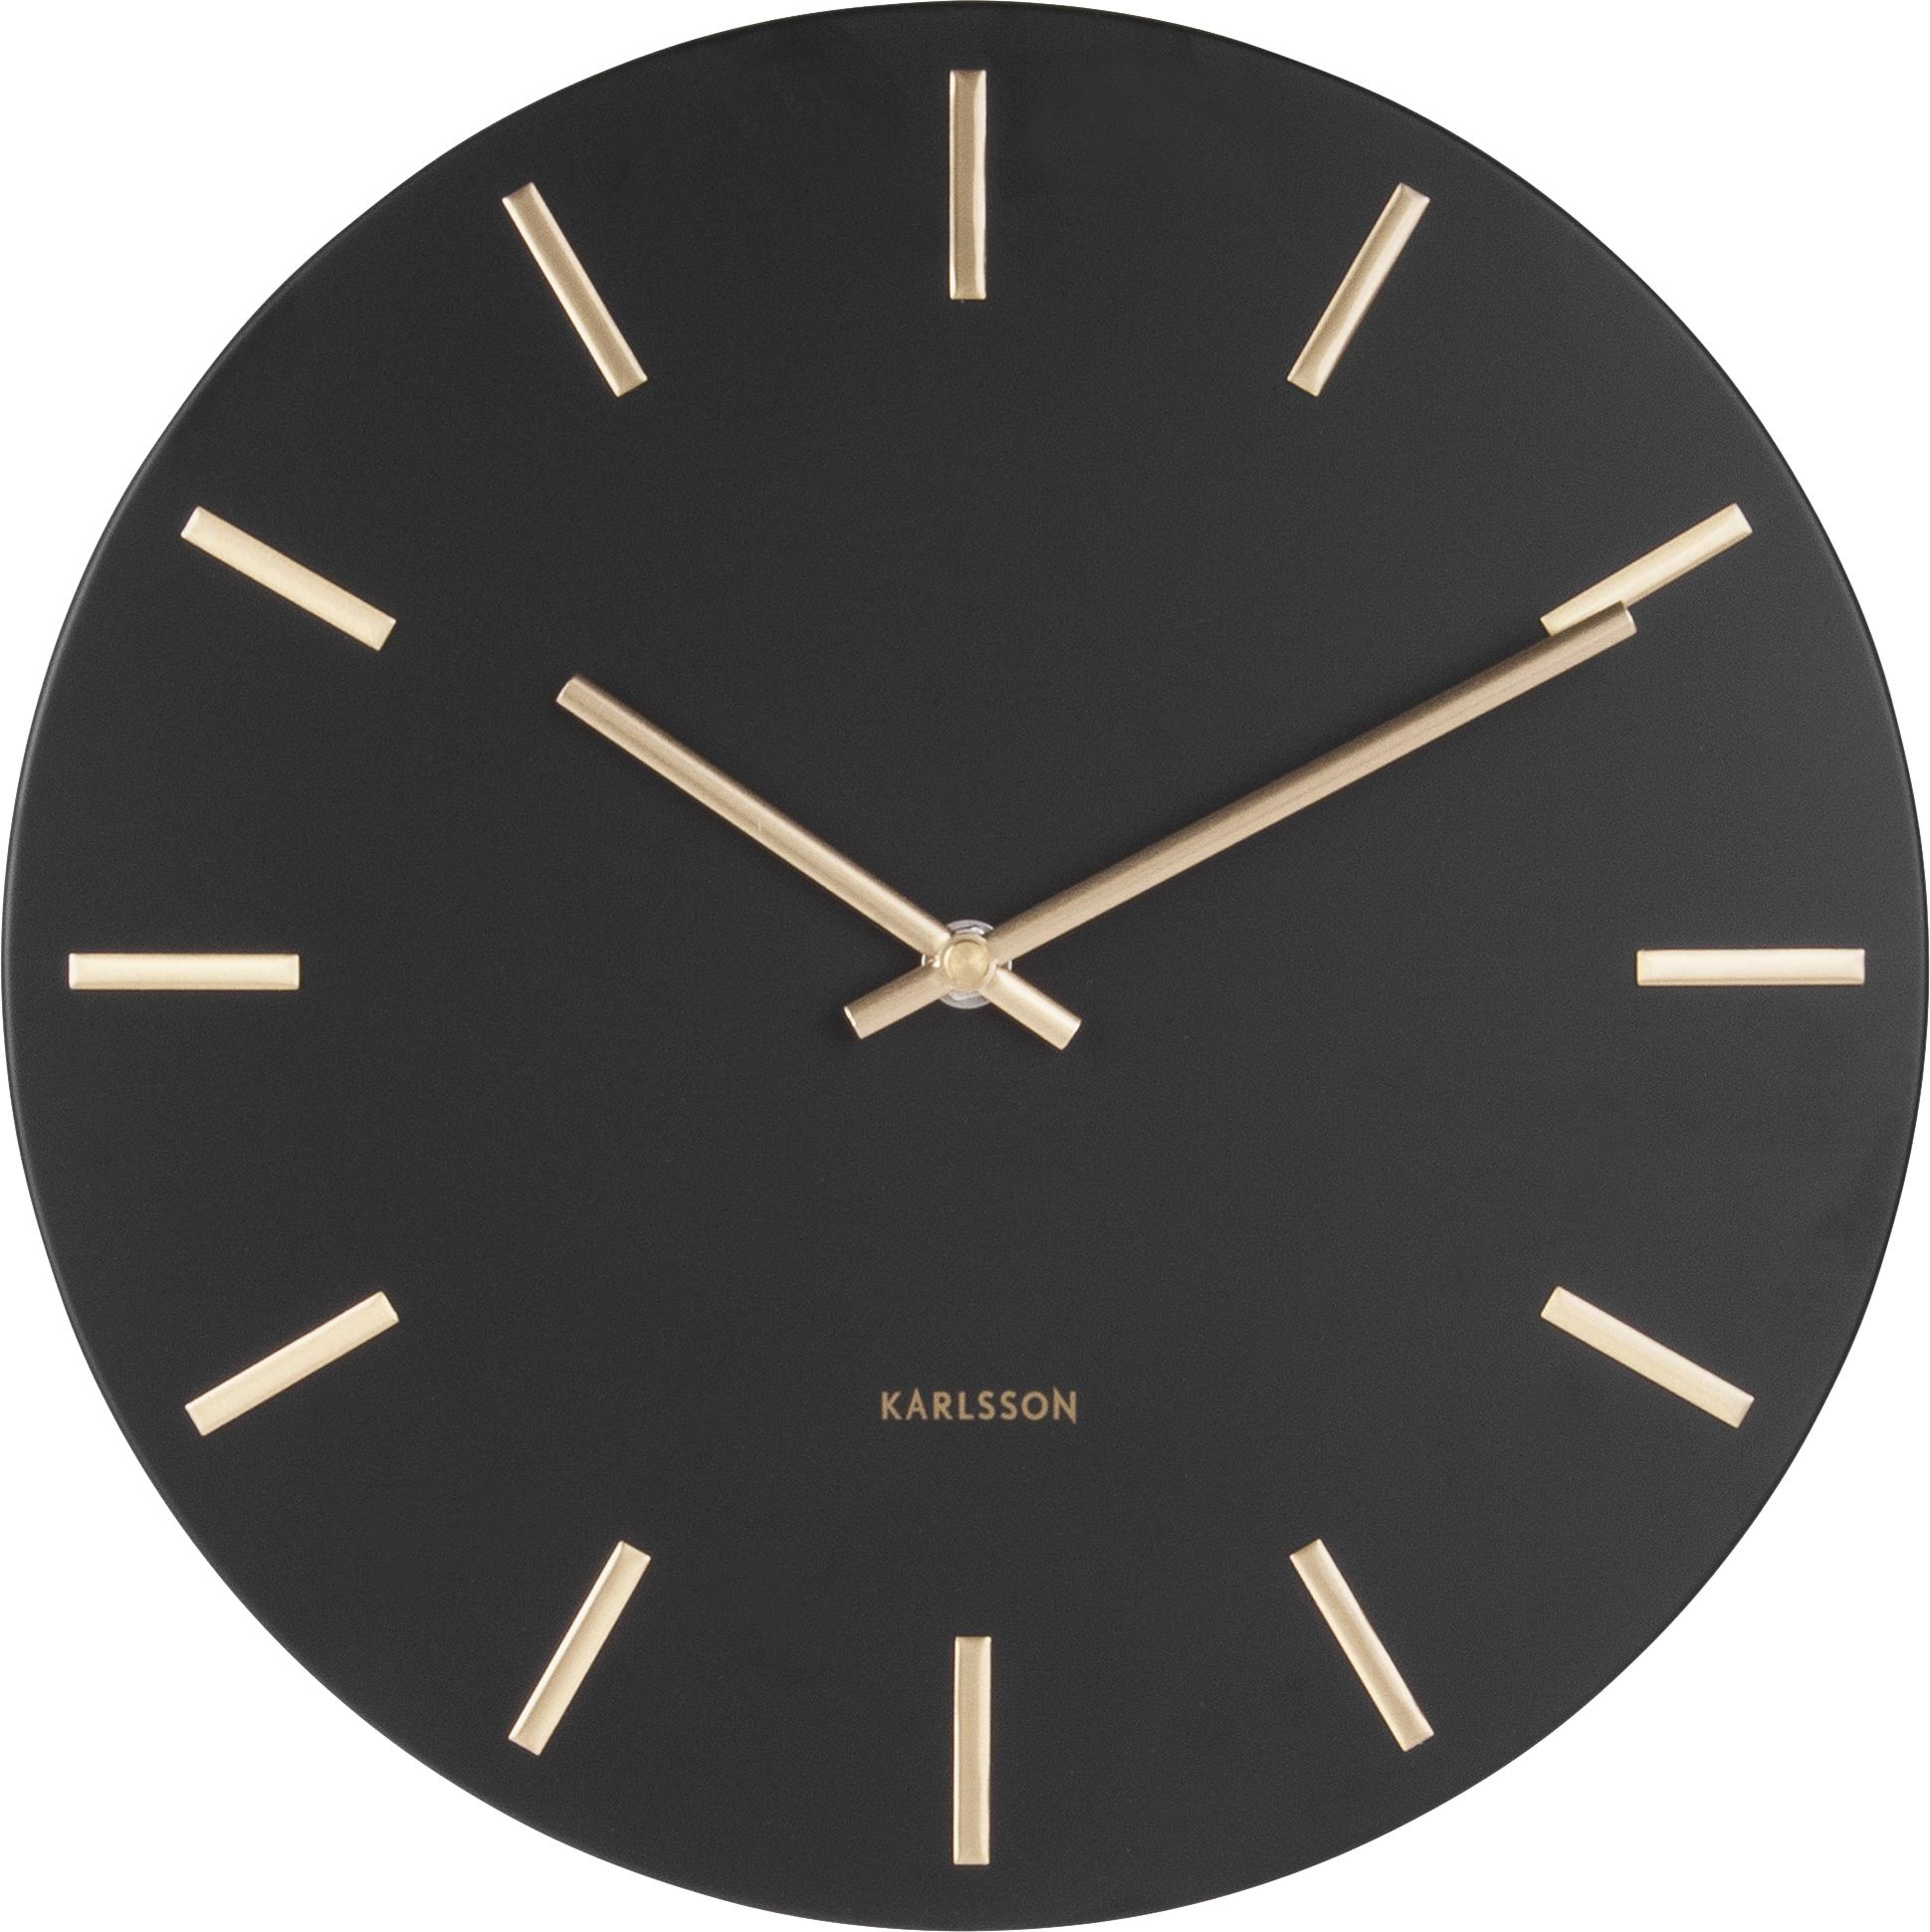 Orologio da parete Charm, Acciaio, verniciato, Nero, Ø 30 x Prof. 4 cm